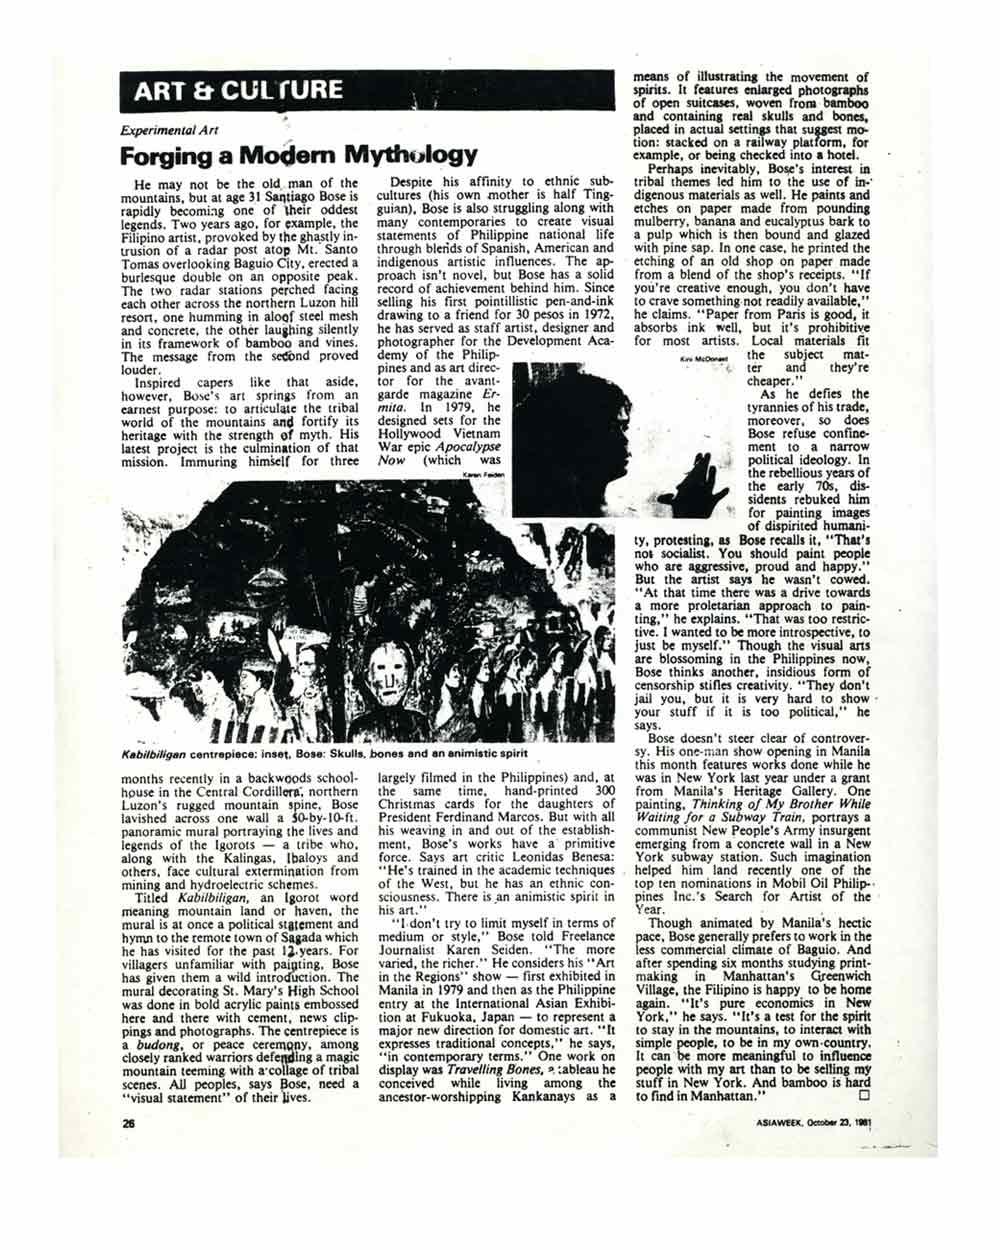 Forging a Modern Mythology